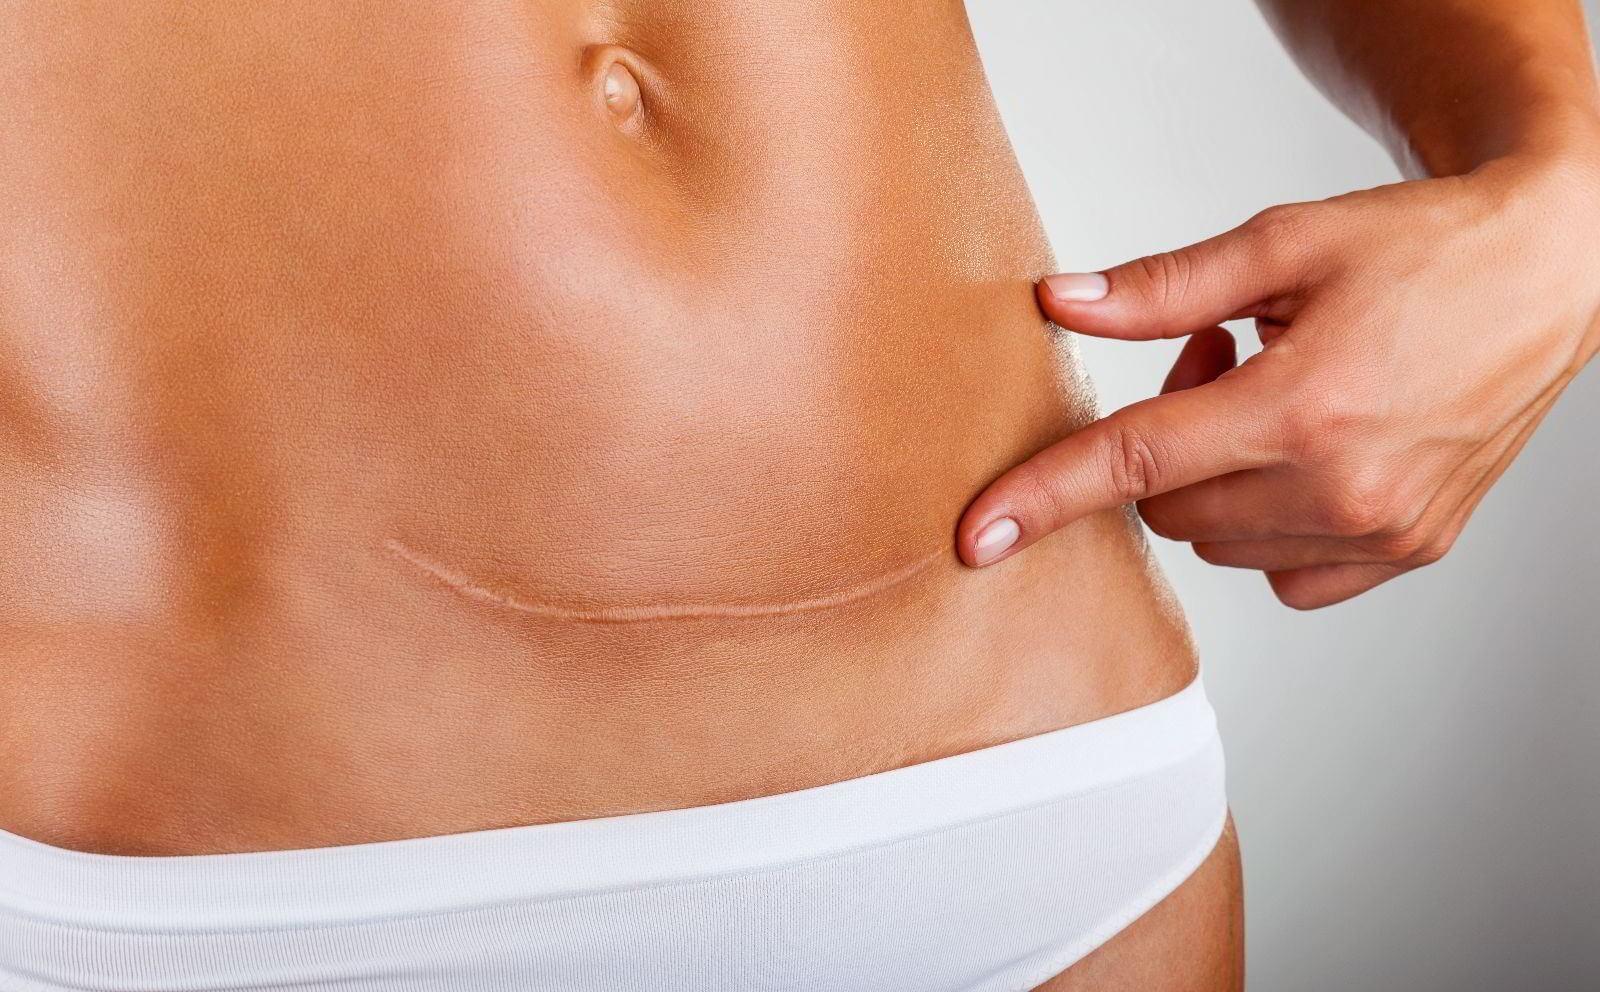 Cicatriz de parto por cesárea.